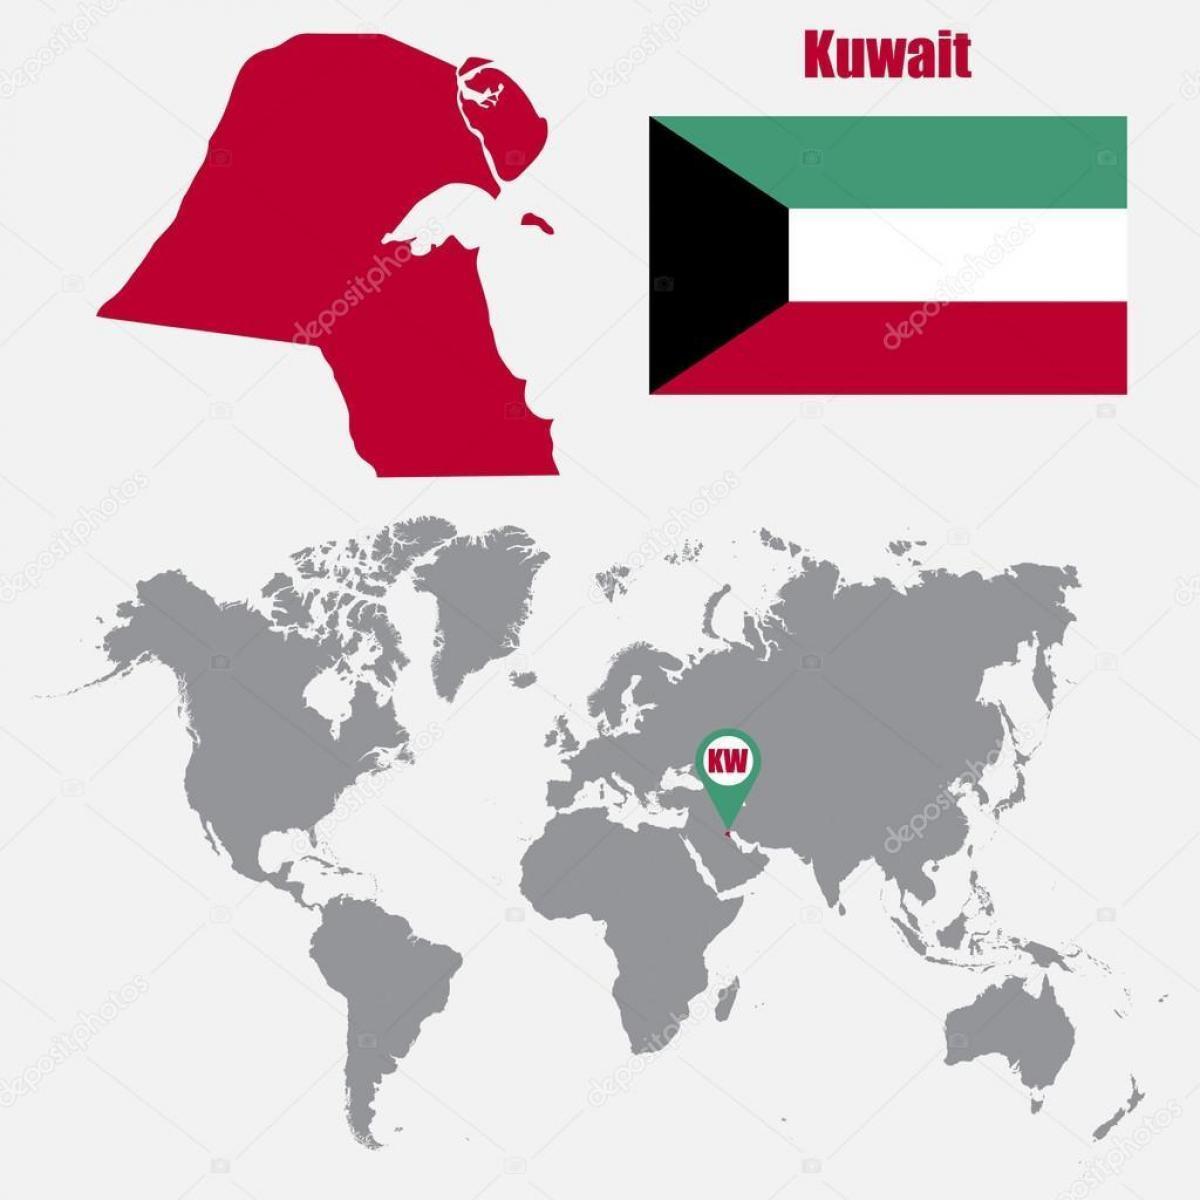 Kuwait location on world map kuwait map in world map western asia kuwait map in world map gumiabroncs Choice Image